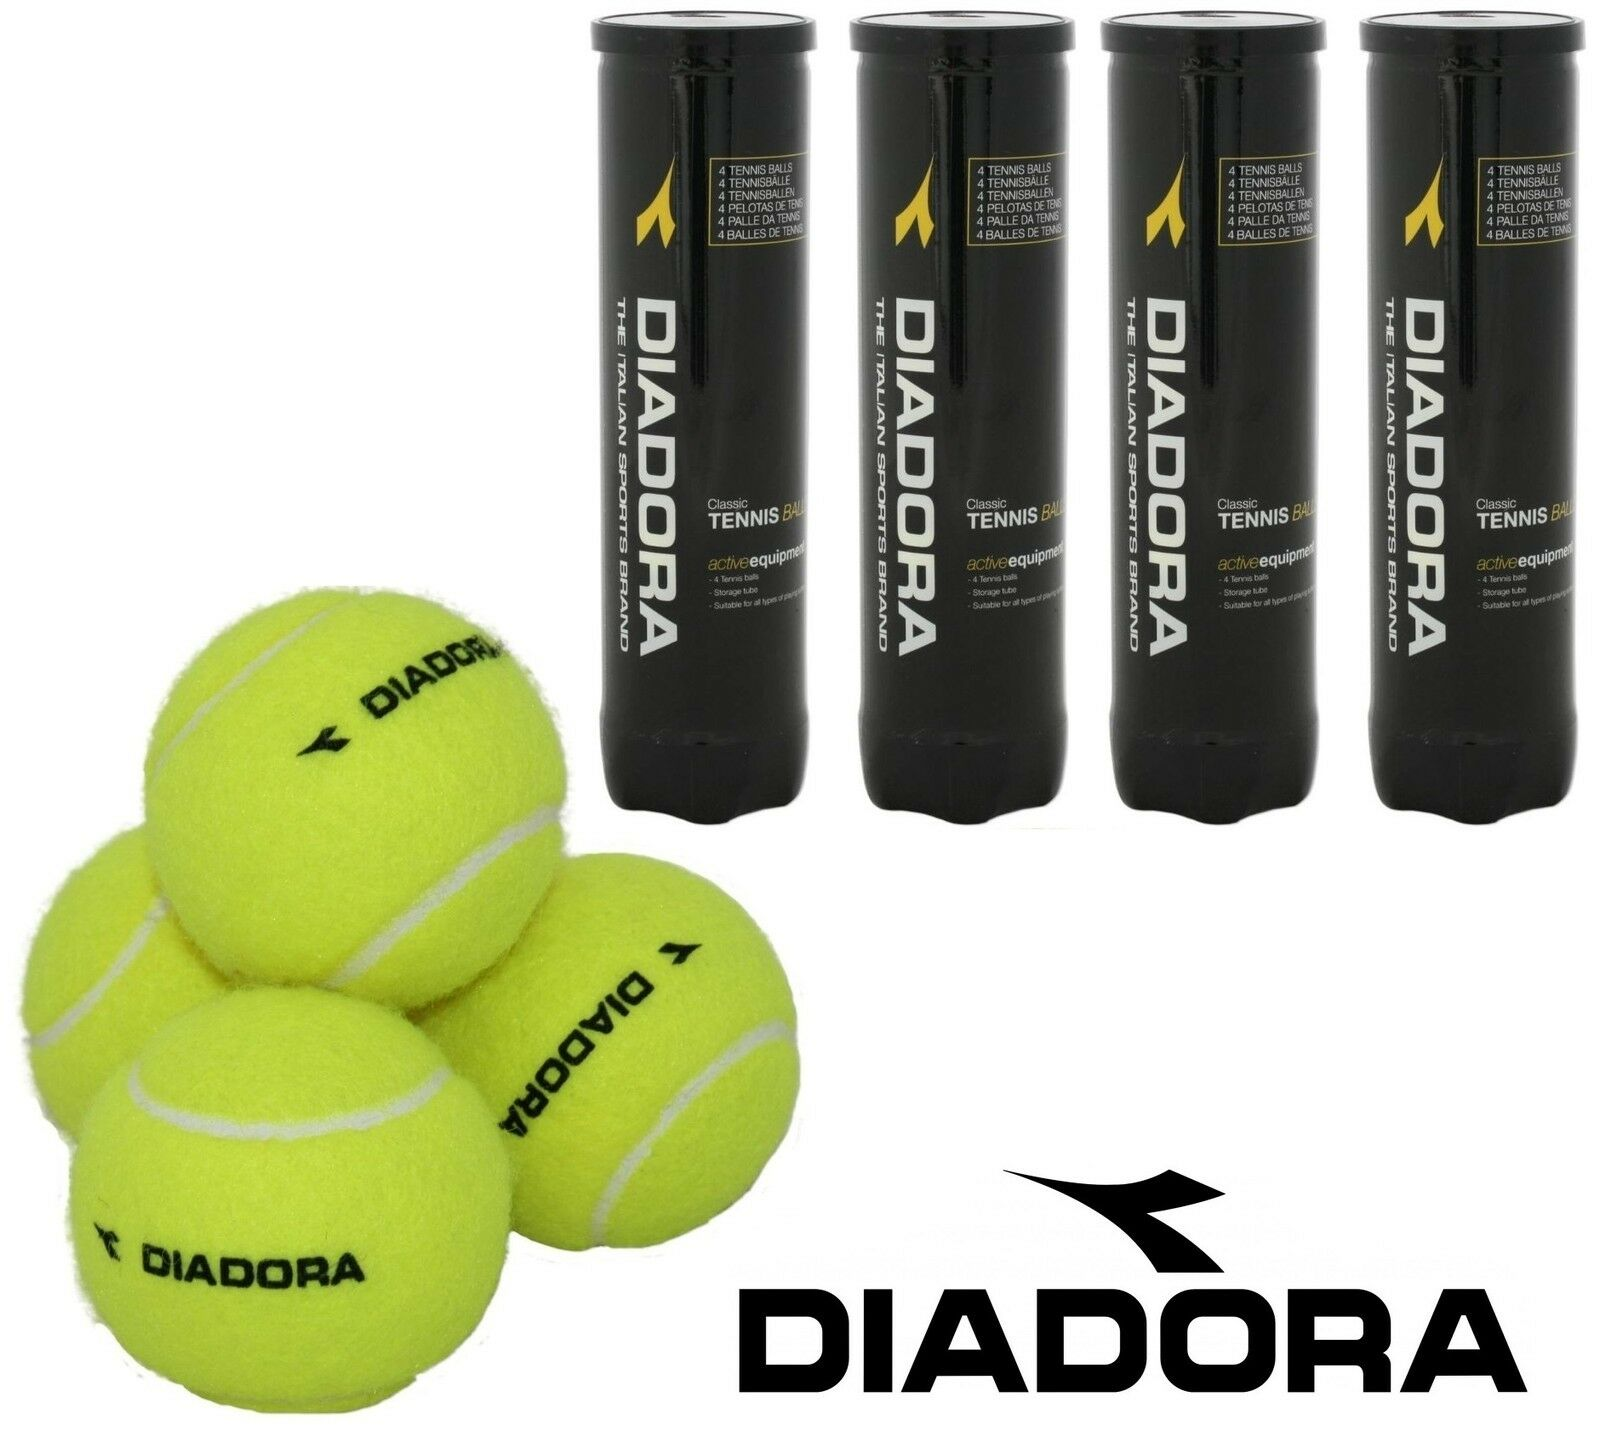 DIADORA® Classic Tennis Balls Pressurised Sealed Storage Tube for All Surface